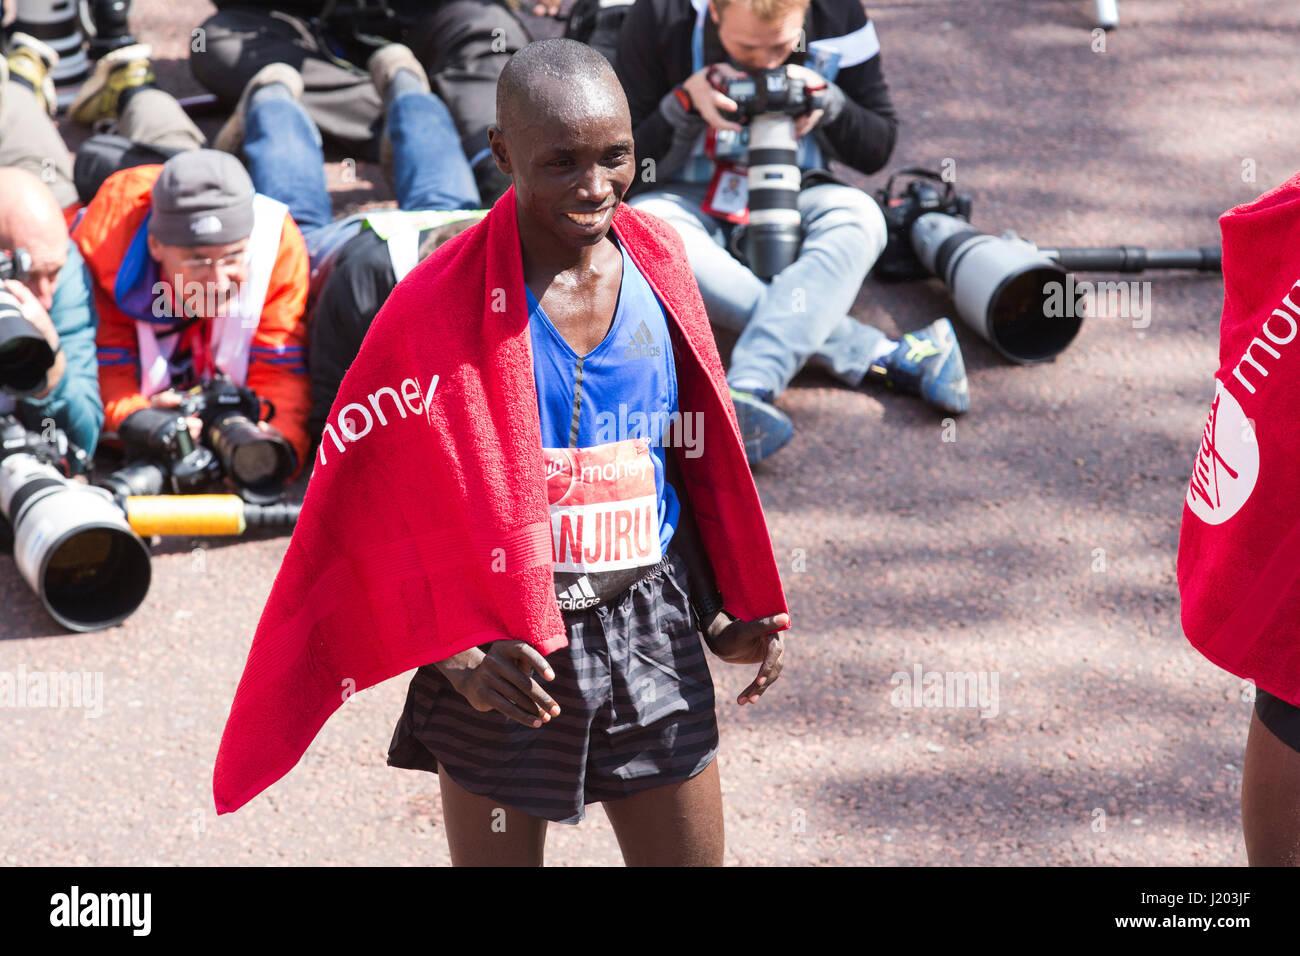 London, UK. 23rd Apr, 2017. Winner Daniel Wanjiru (KEN). The 37th London Marathon finishes on the Mall. Credit: Stock Photo